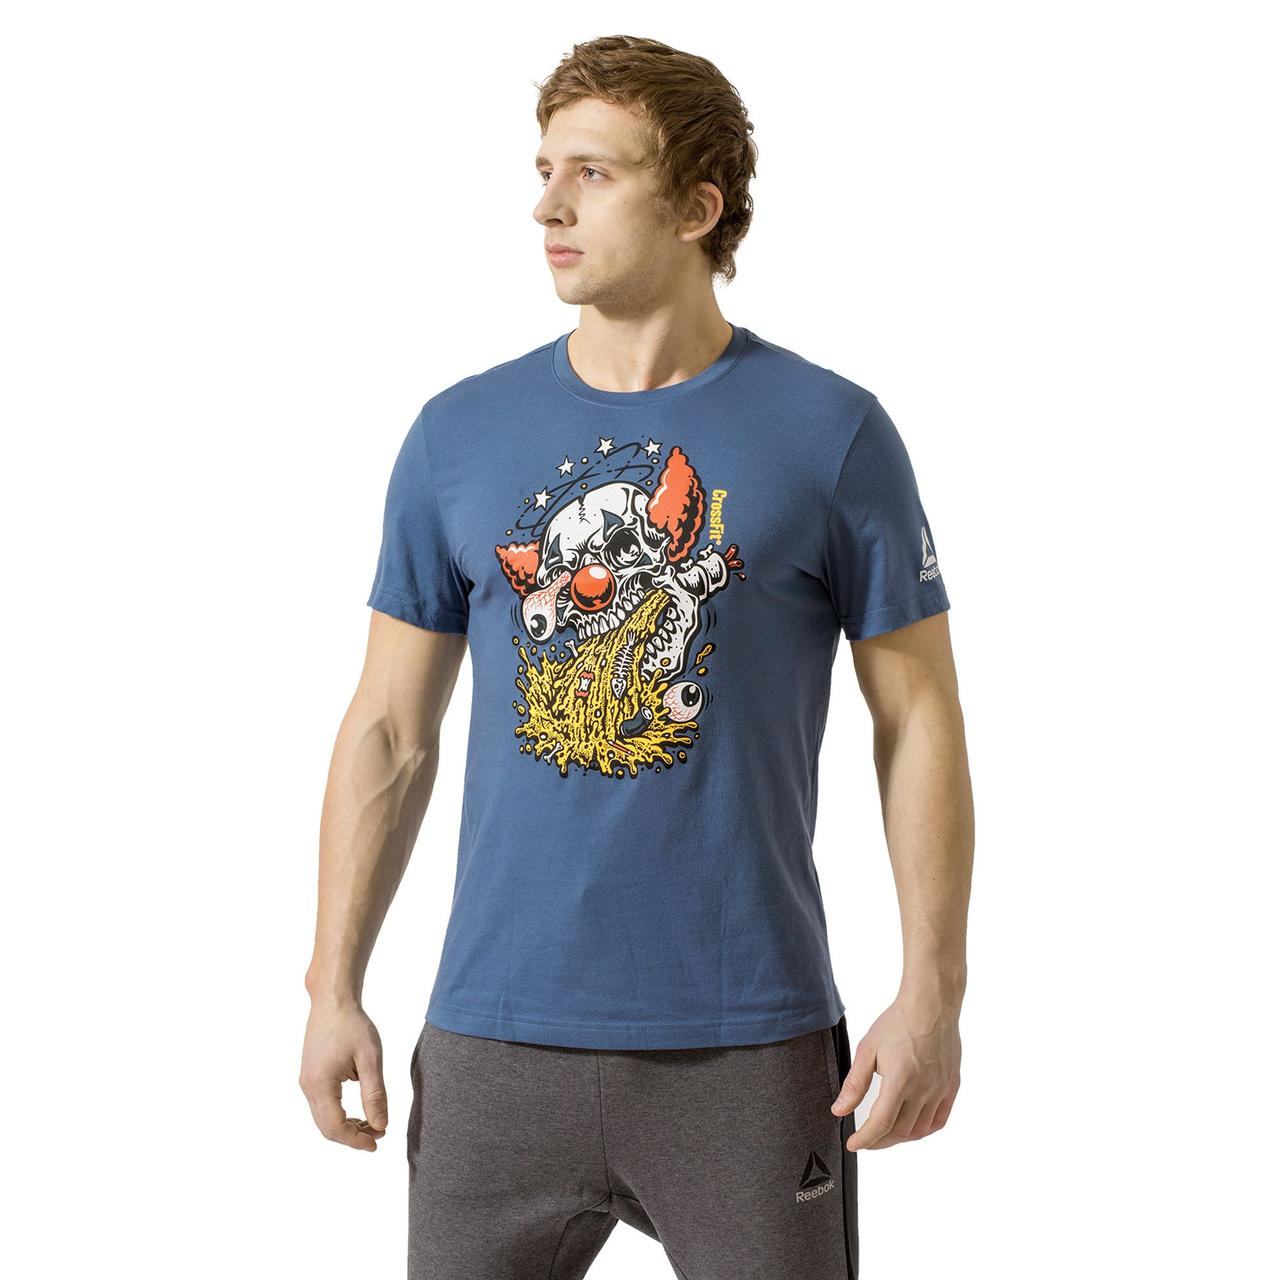 Мужская футболка Reebok CrossFit Pukie (Артикул  CD1005) - Интернет-магазин  «Эксперт df520e8d496d4